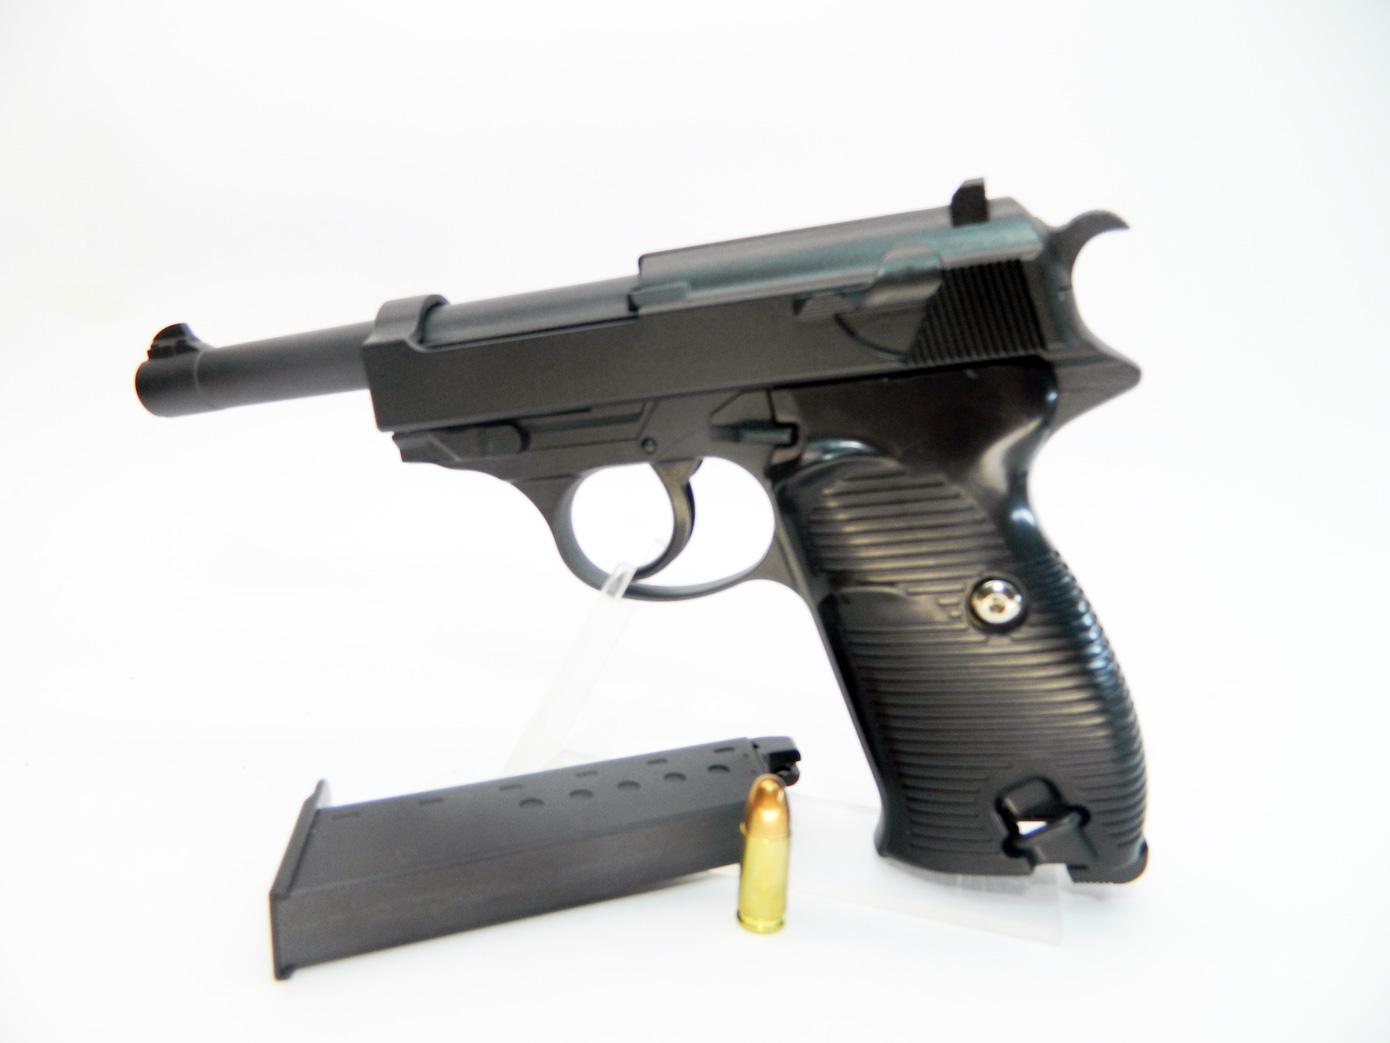 Walther P38 масштаб 1:1 изображение 2